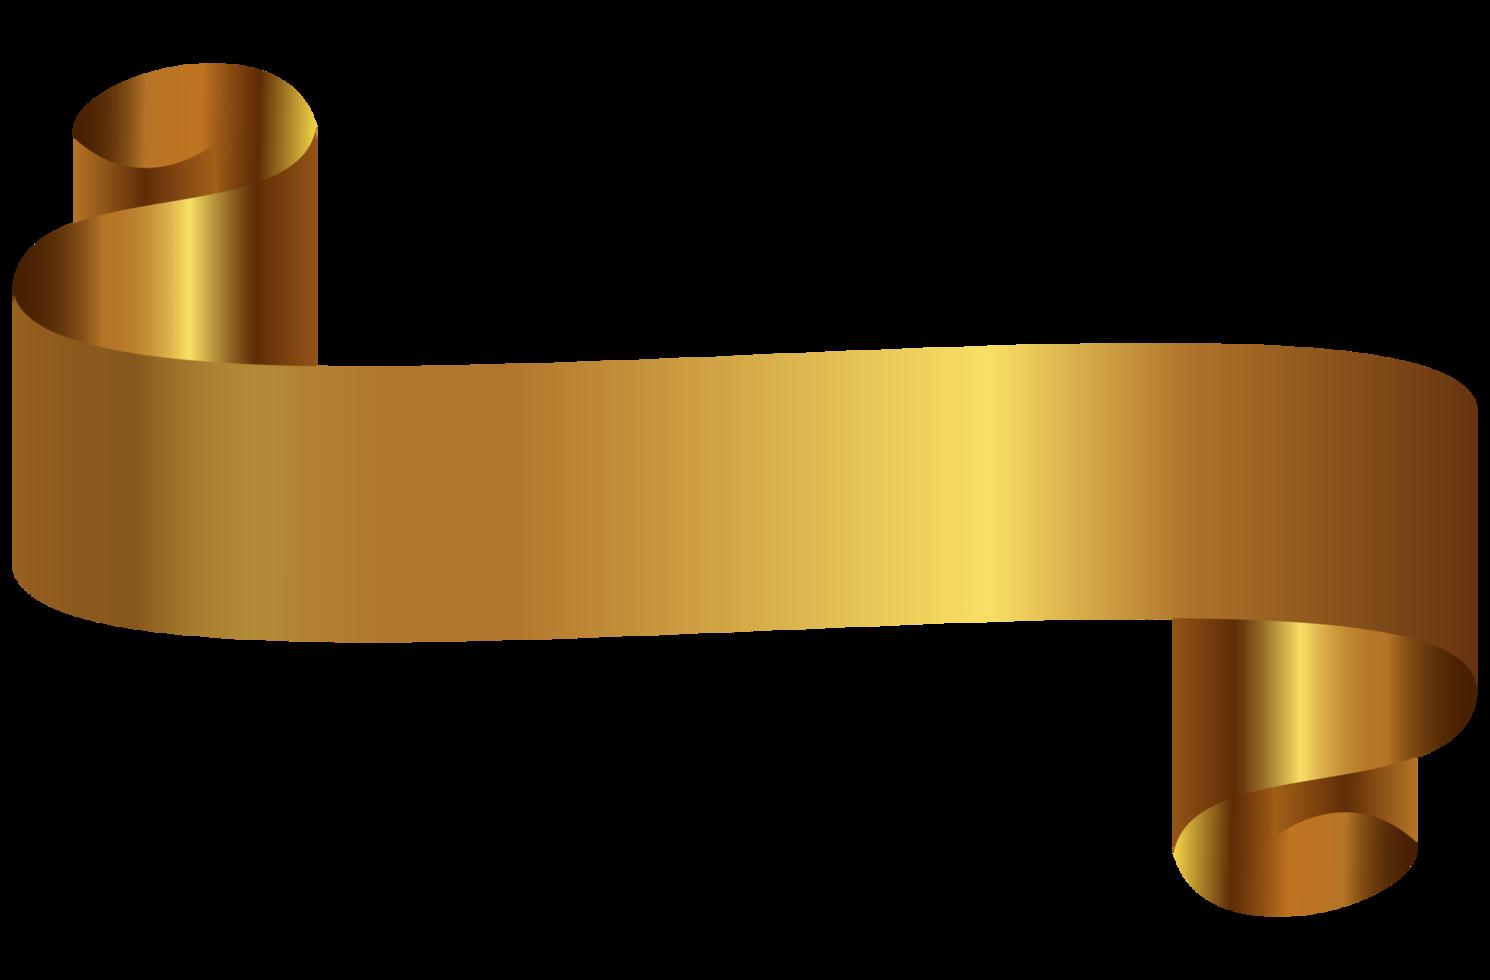 guld band png